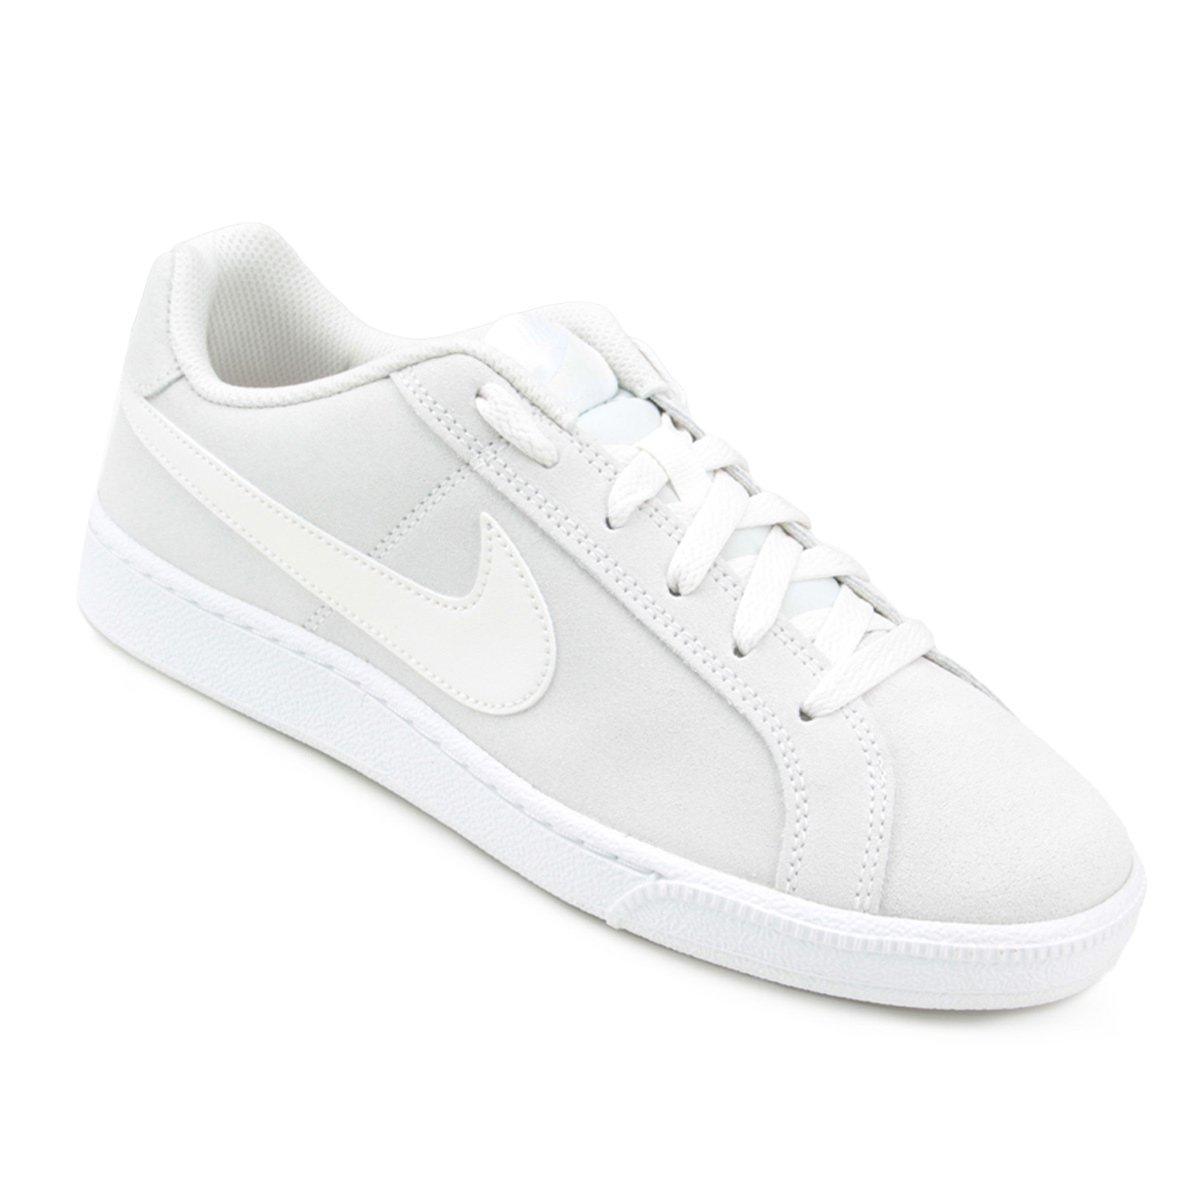 Tênis Nike Wmns Court Royale - Branco - Compre Agora  cbbcd0c92da32